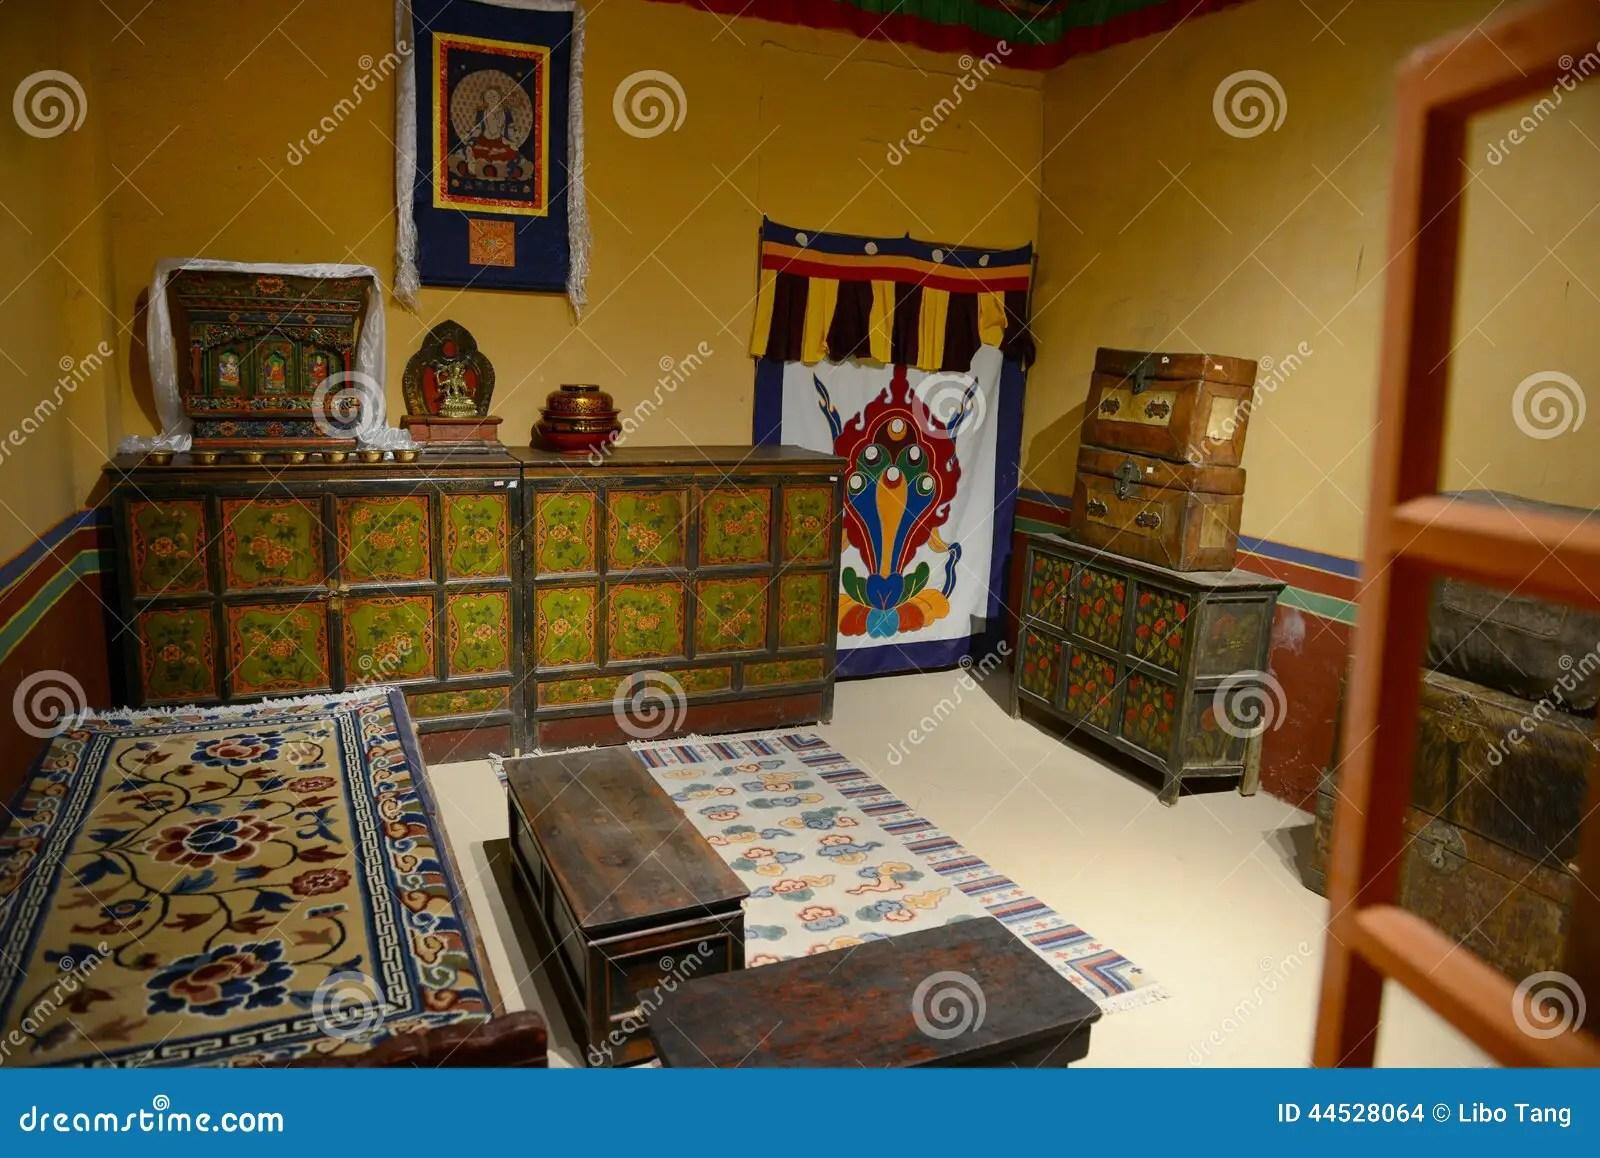 Interior Of Tibetan House Stock Photo  Image 44528064